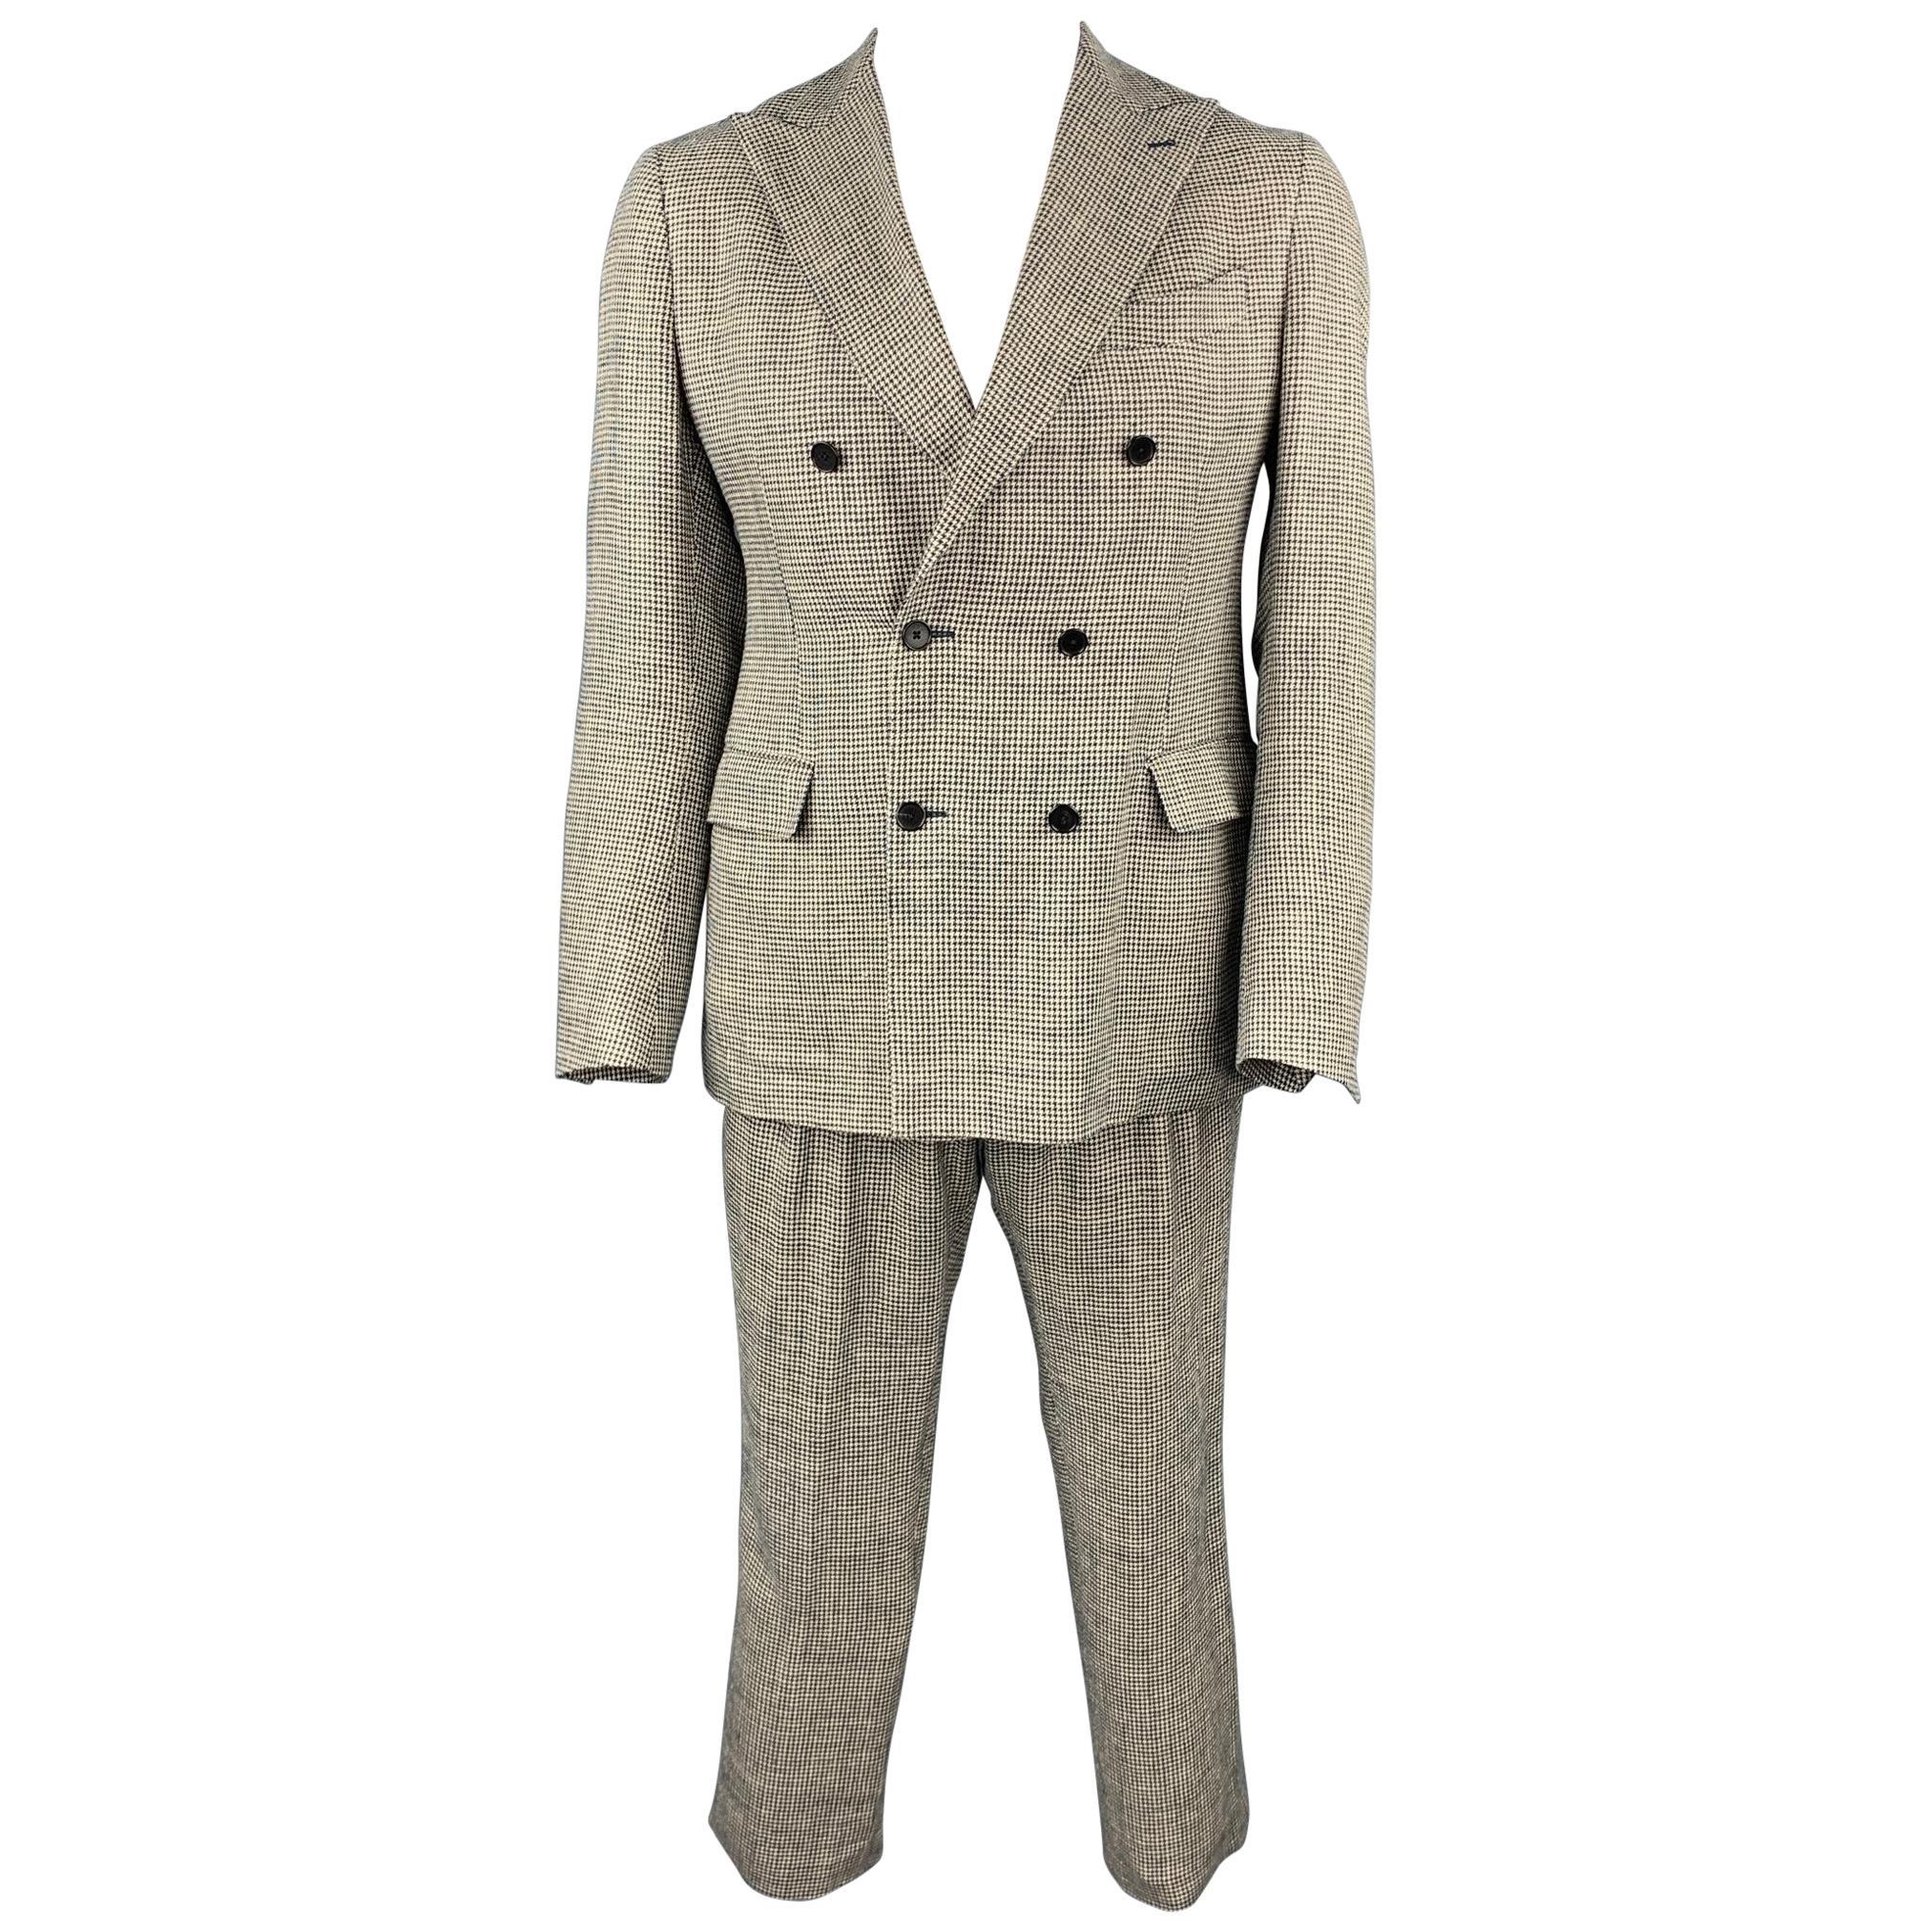 LARDINI Size 42 Regular Black & Beige Houndstooth Silk / Linen Suit